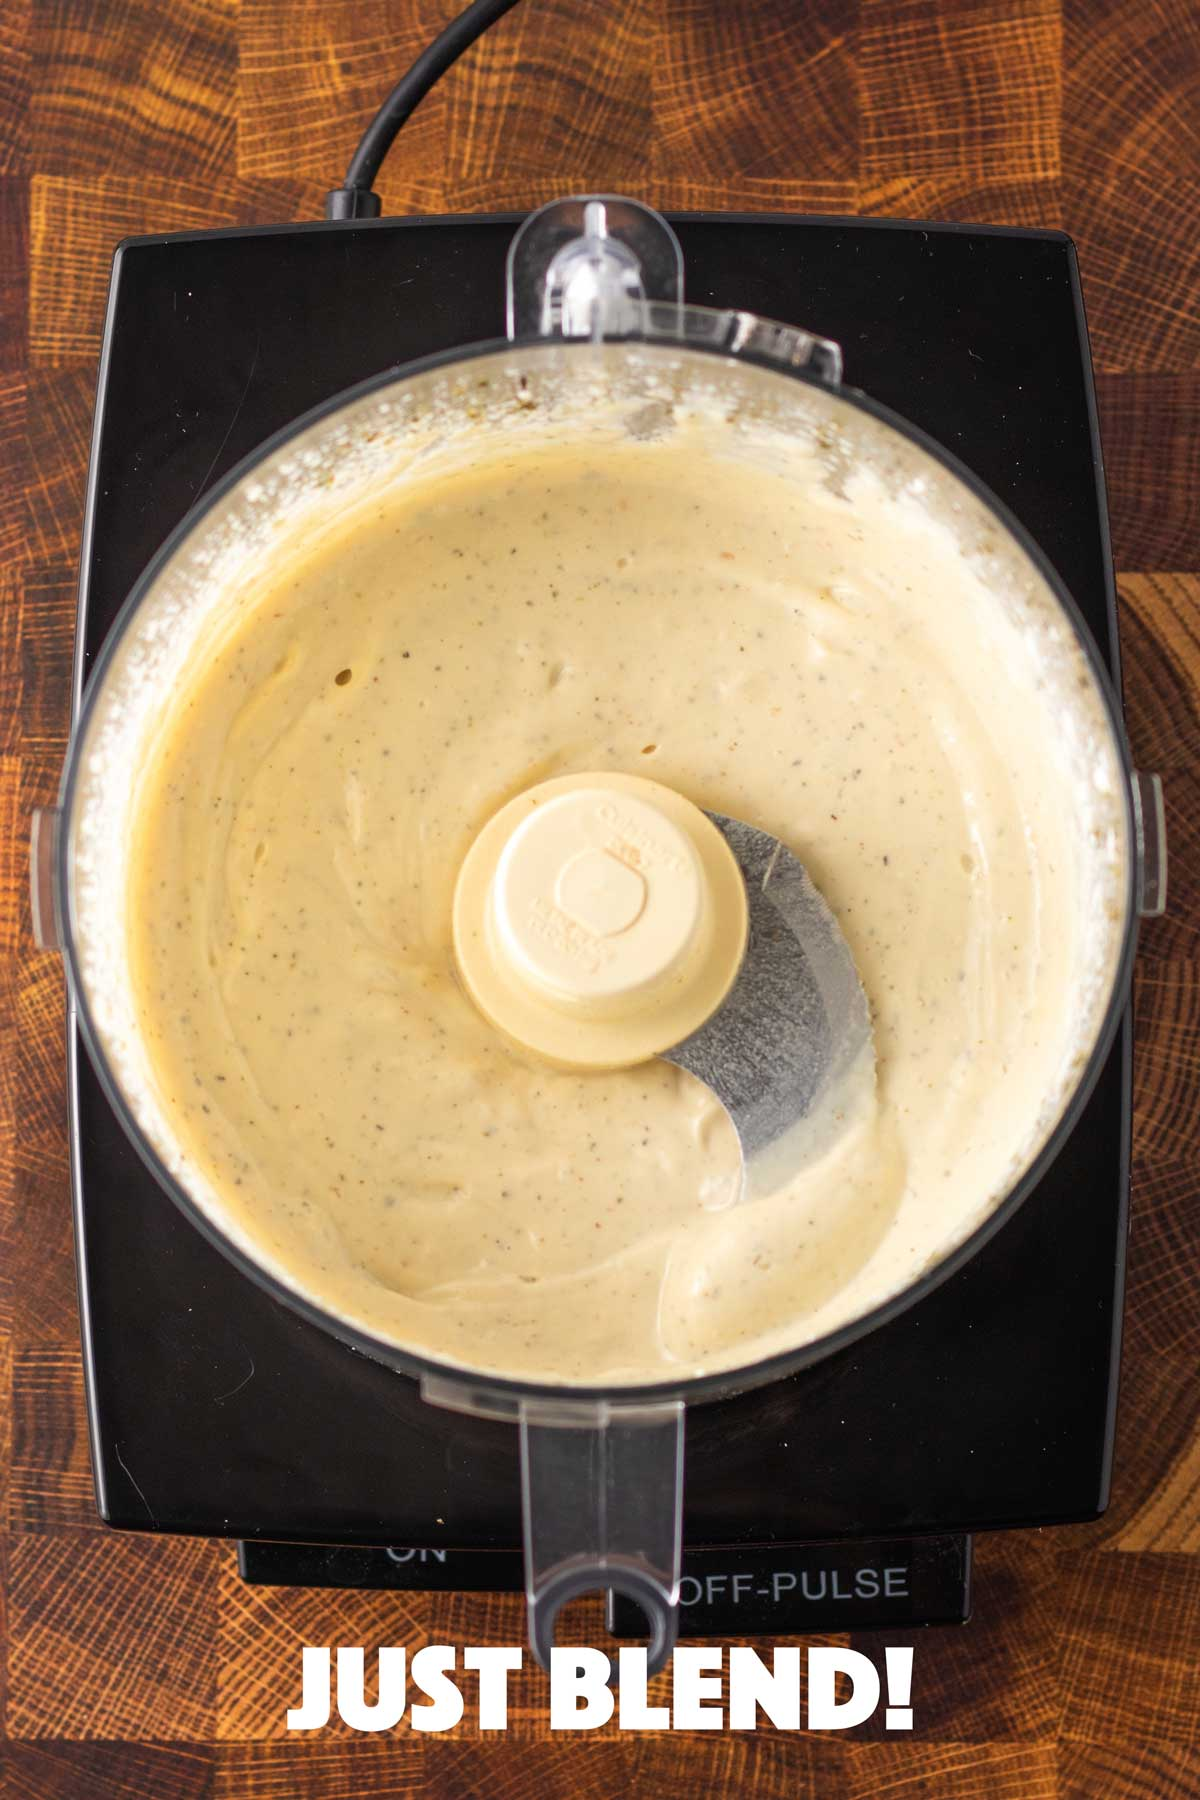 overhead of a food processor with creamy tofu-based dressing inside